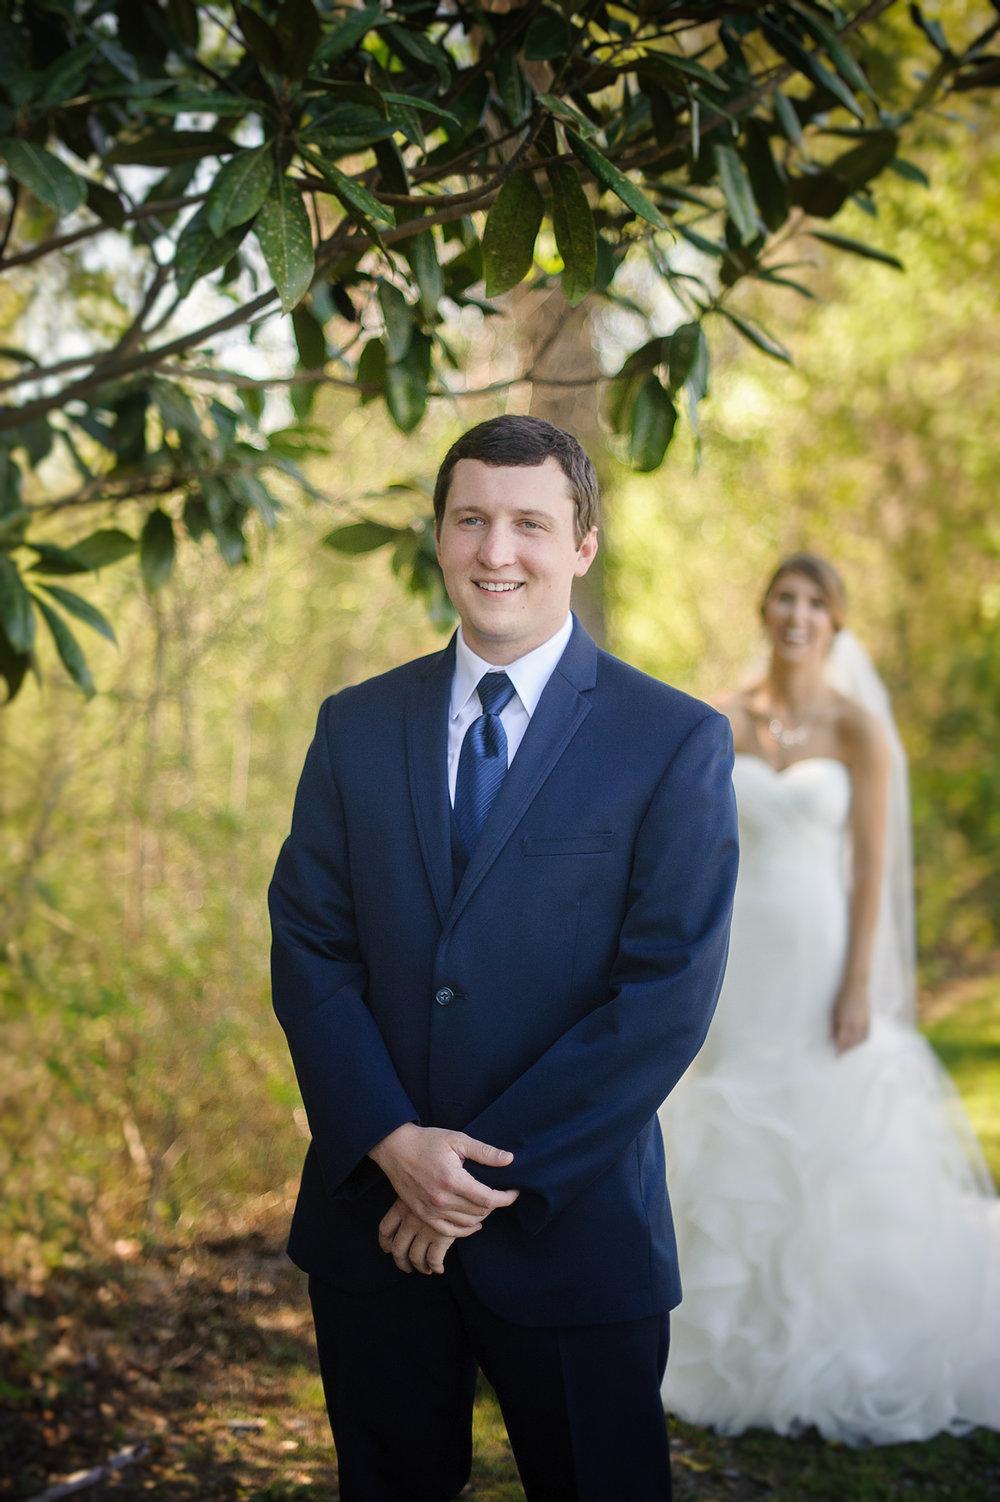 FIRST LOOK WEDDING PHOTOS-1.JPG